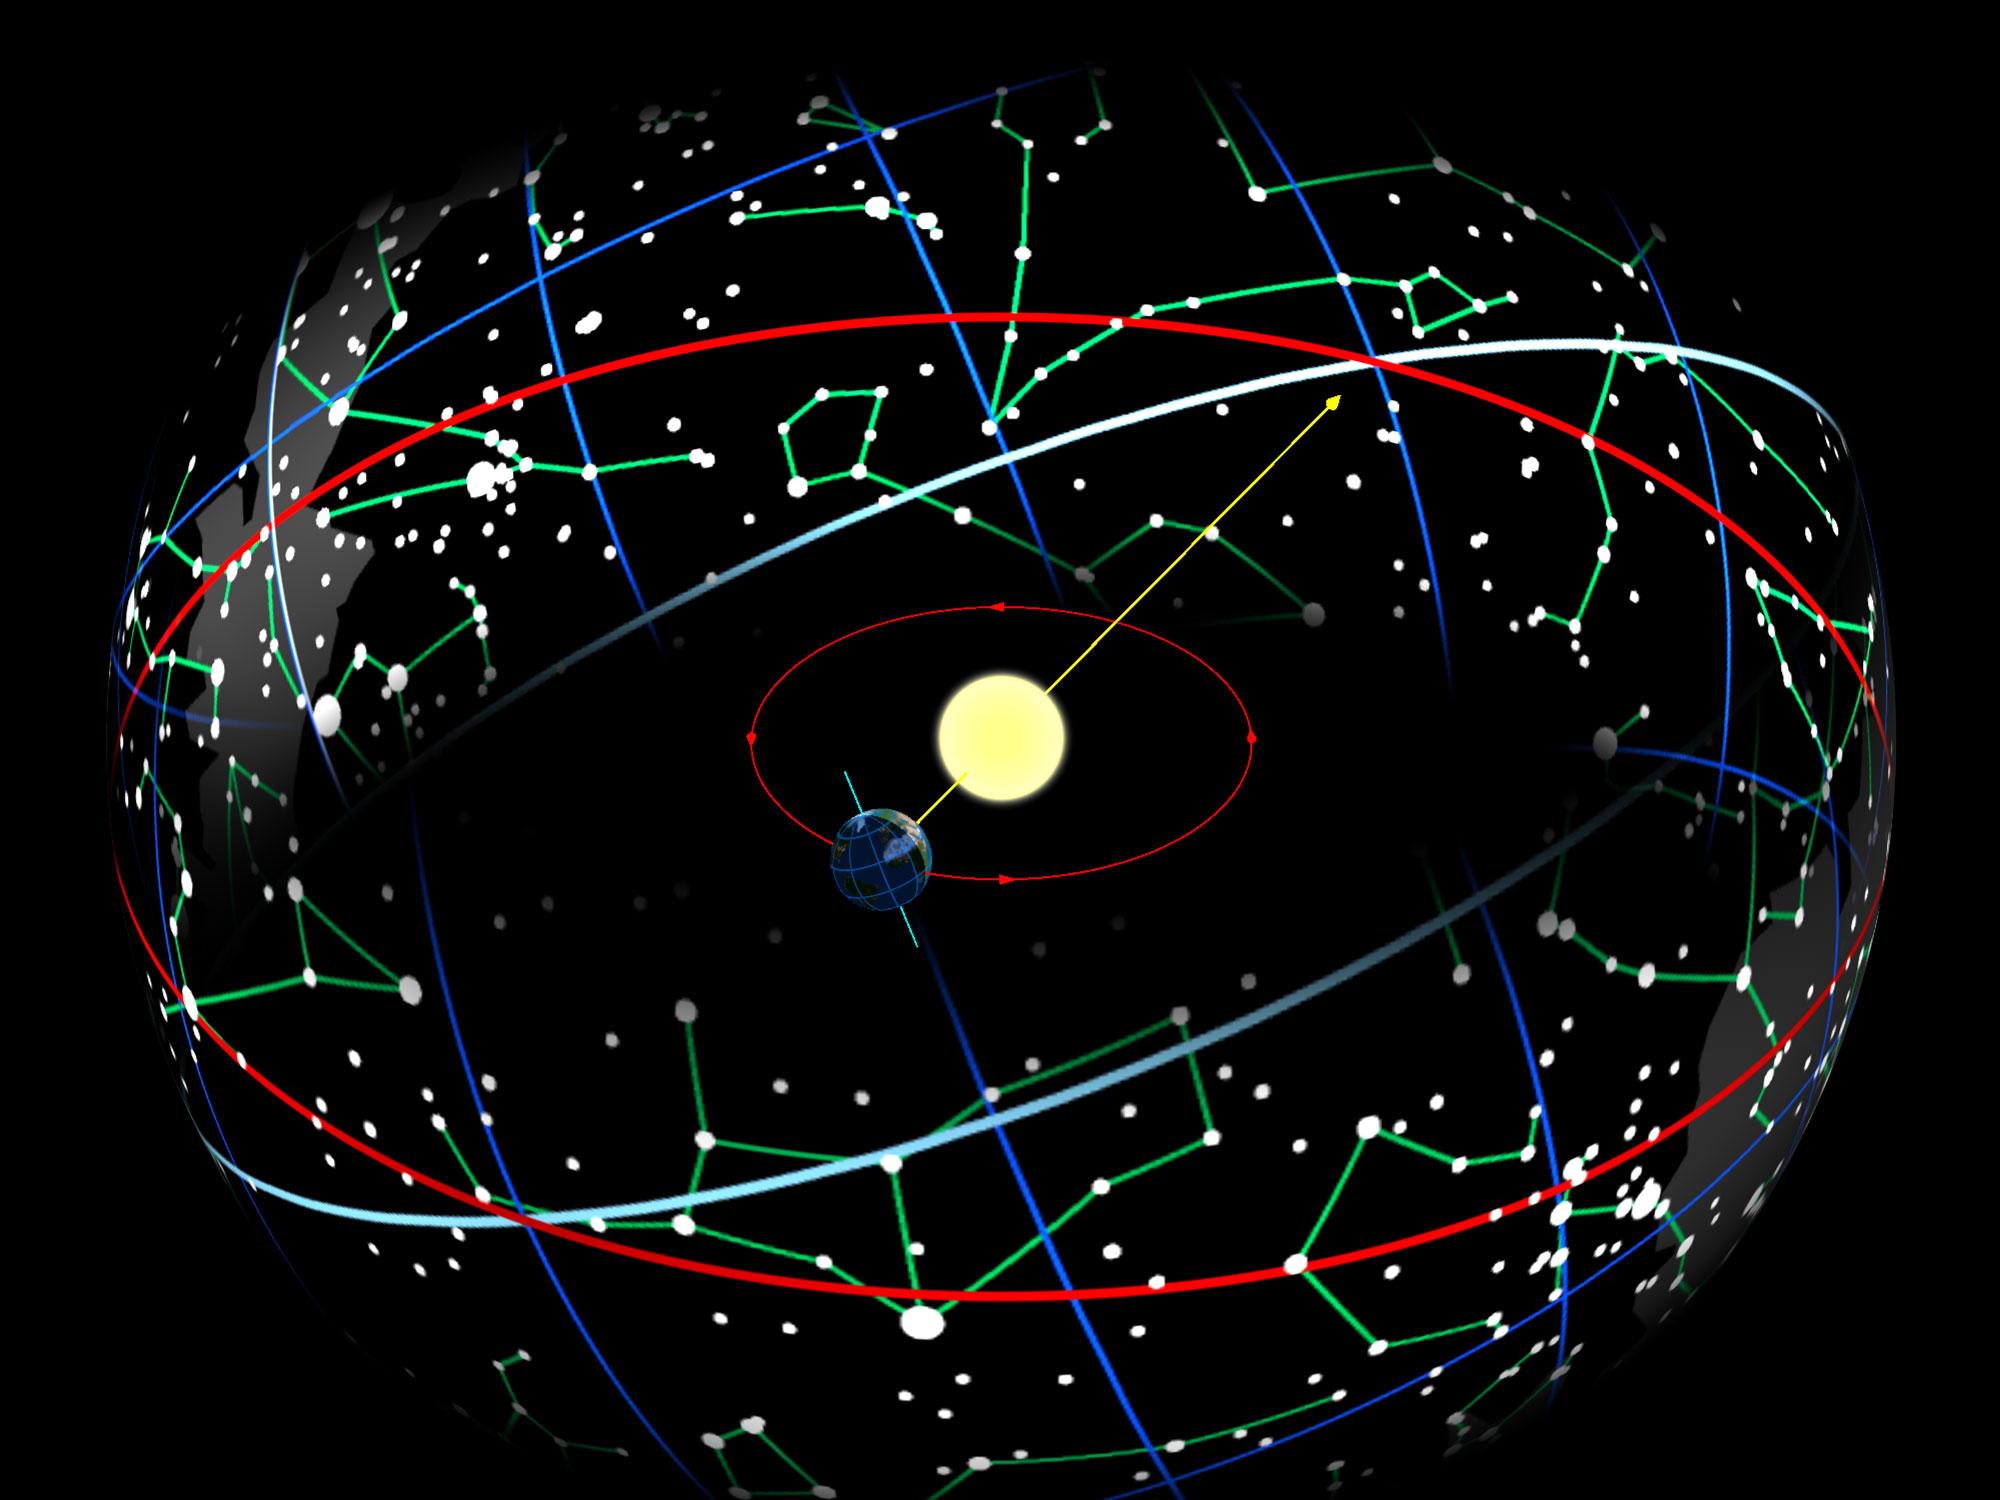 Nirayana zodiac circle in tamil க்கான பட முடிவு